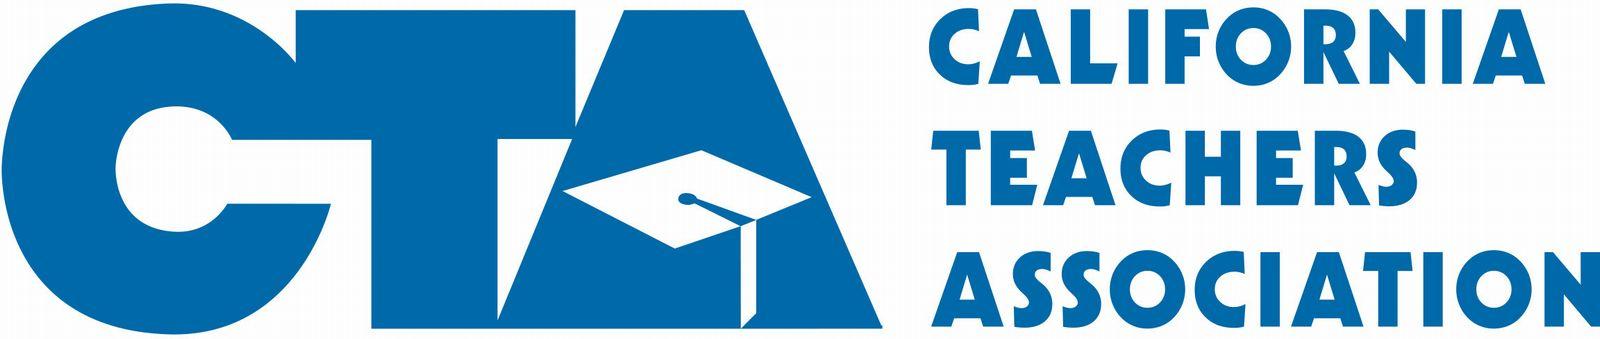 CASC The California Association of School Counselors, Inc